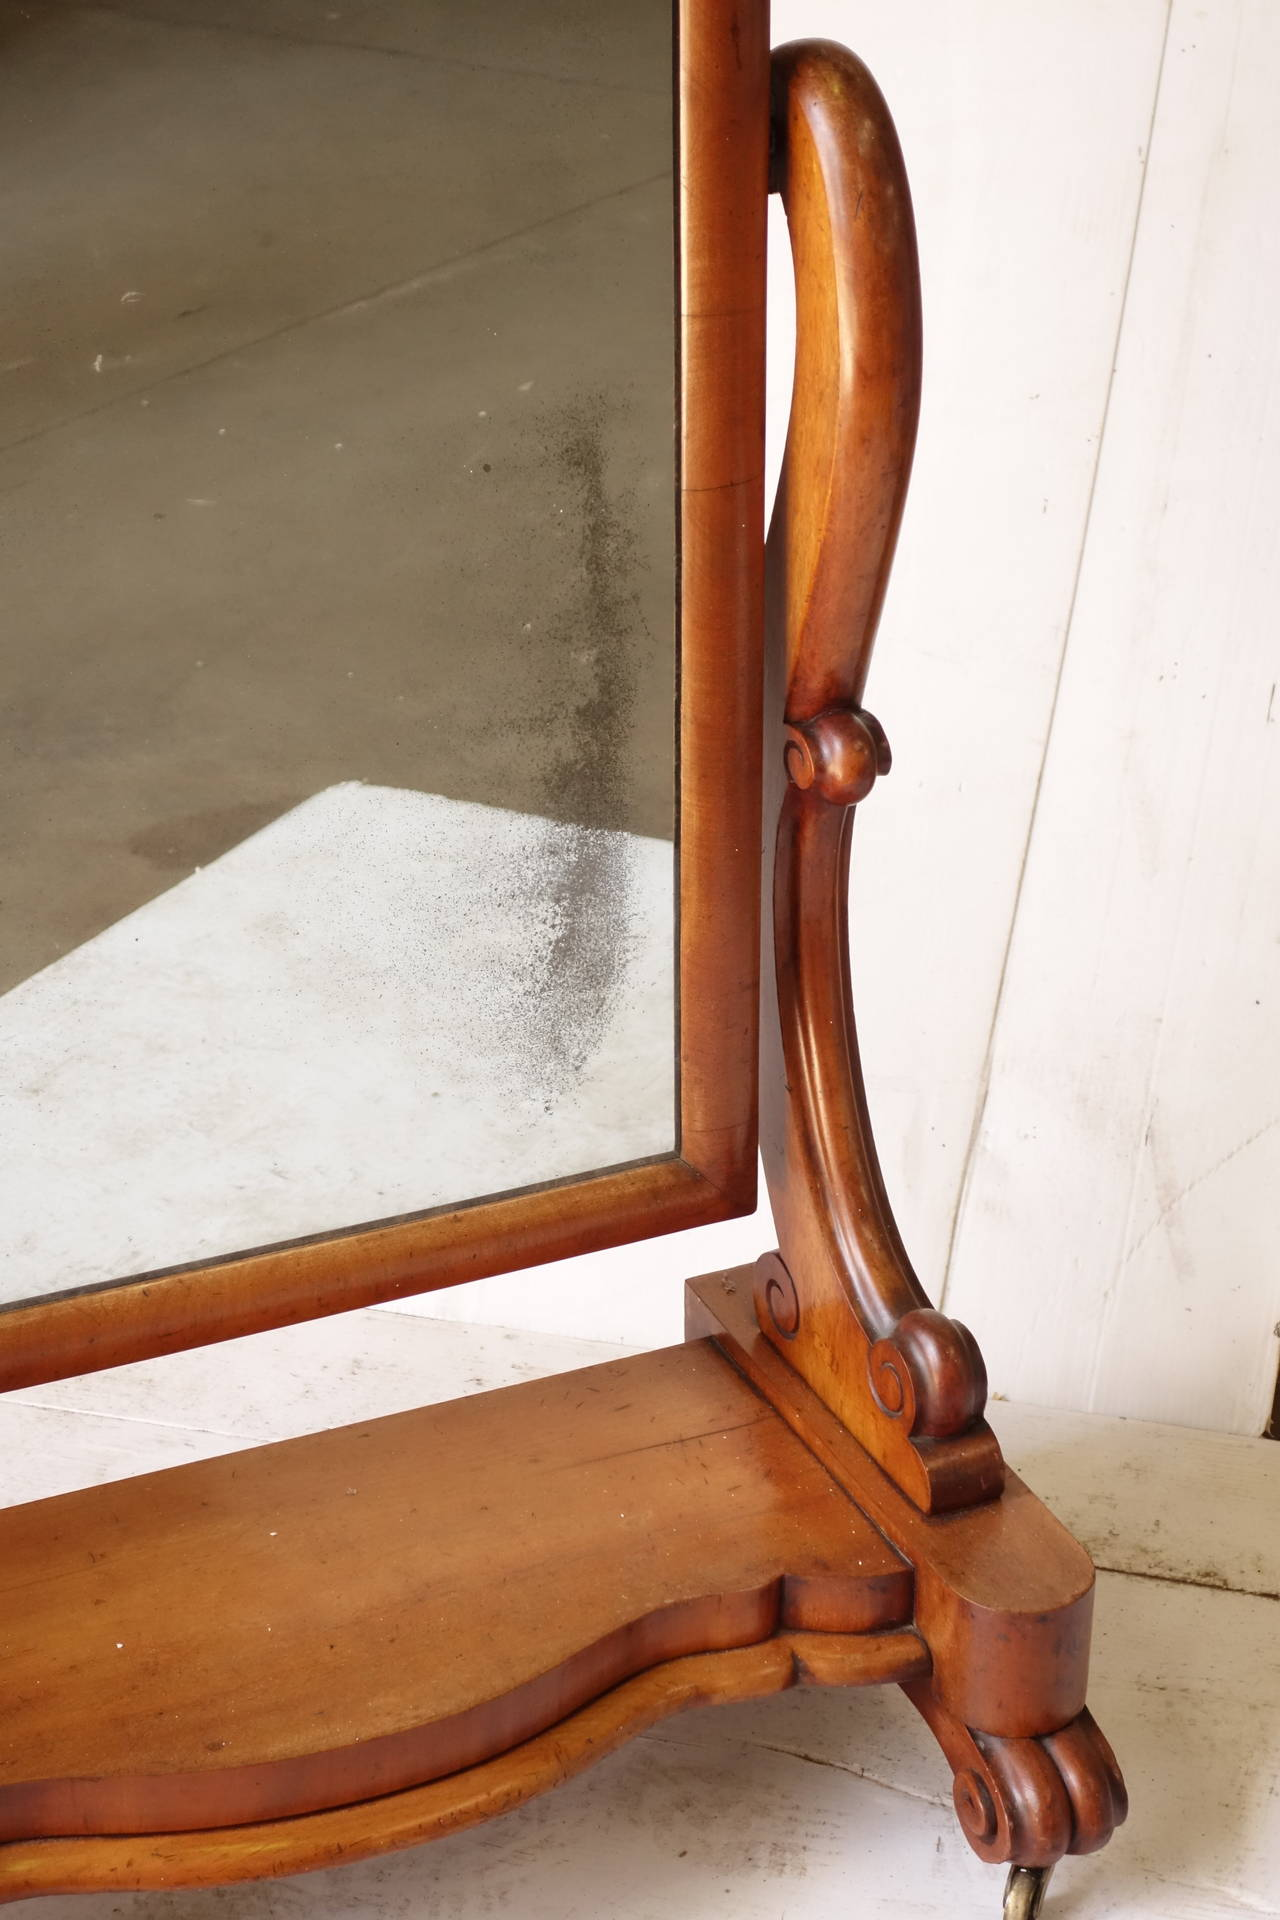 Victorian Floor Mirror For Sale - The Ground Beneath Her Feet